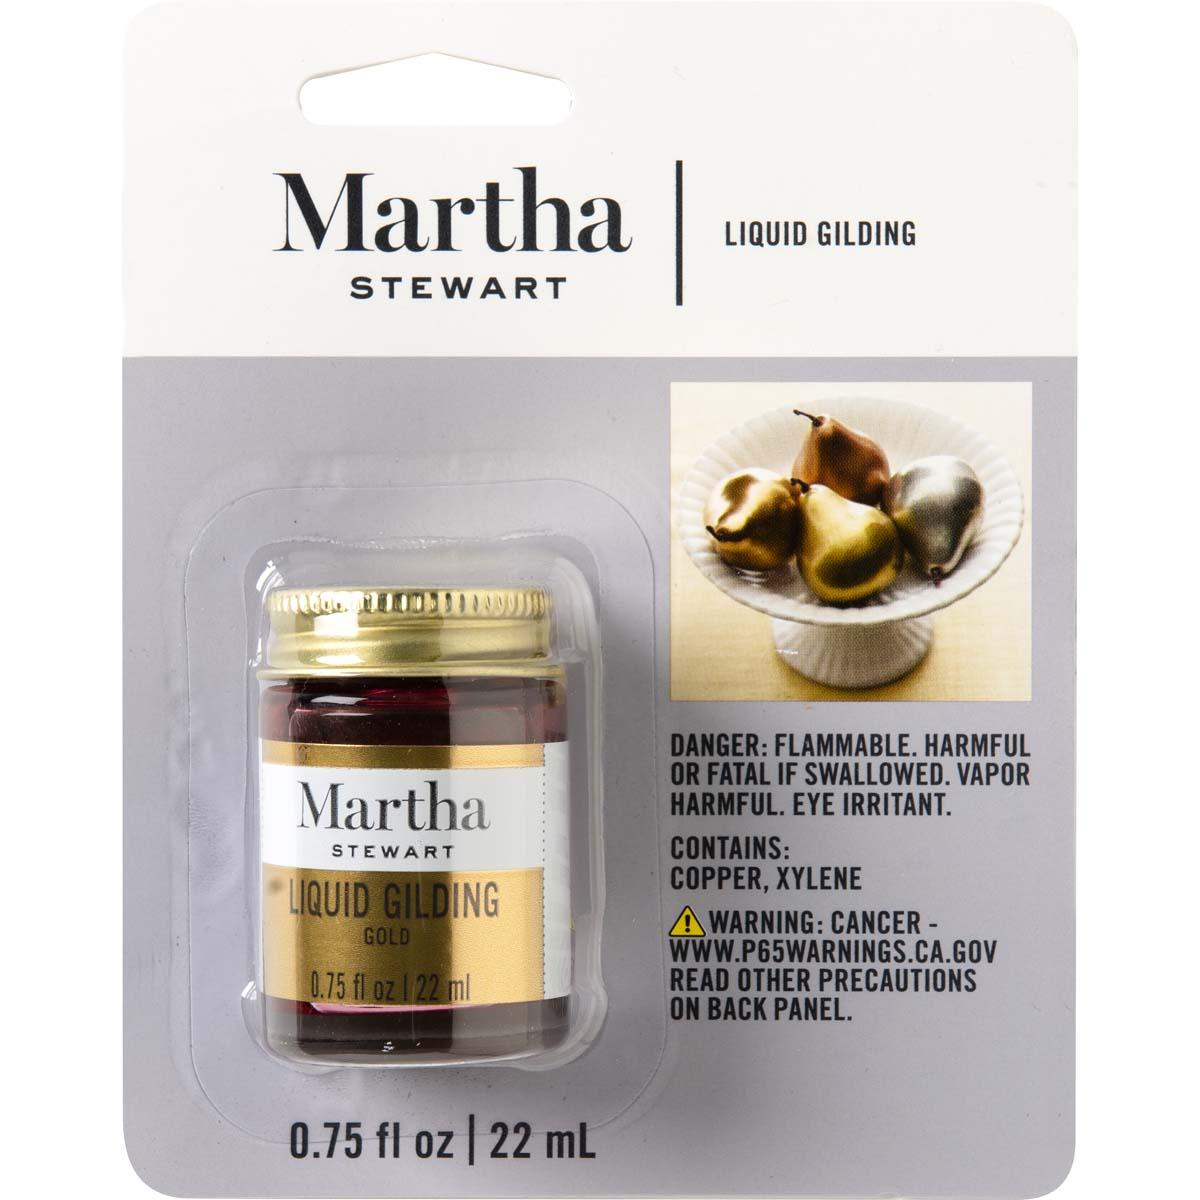 Martha Stewart ® Liquid Gilding, 3/4 oz. Gold - 32214